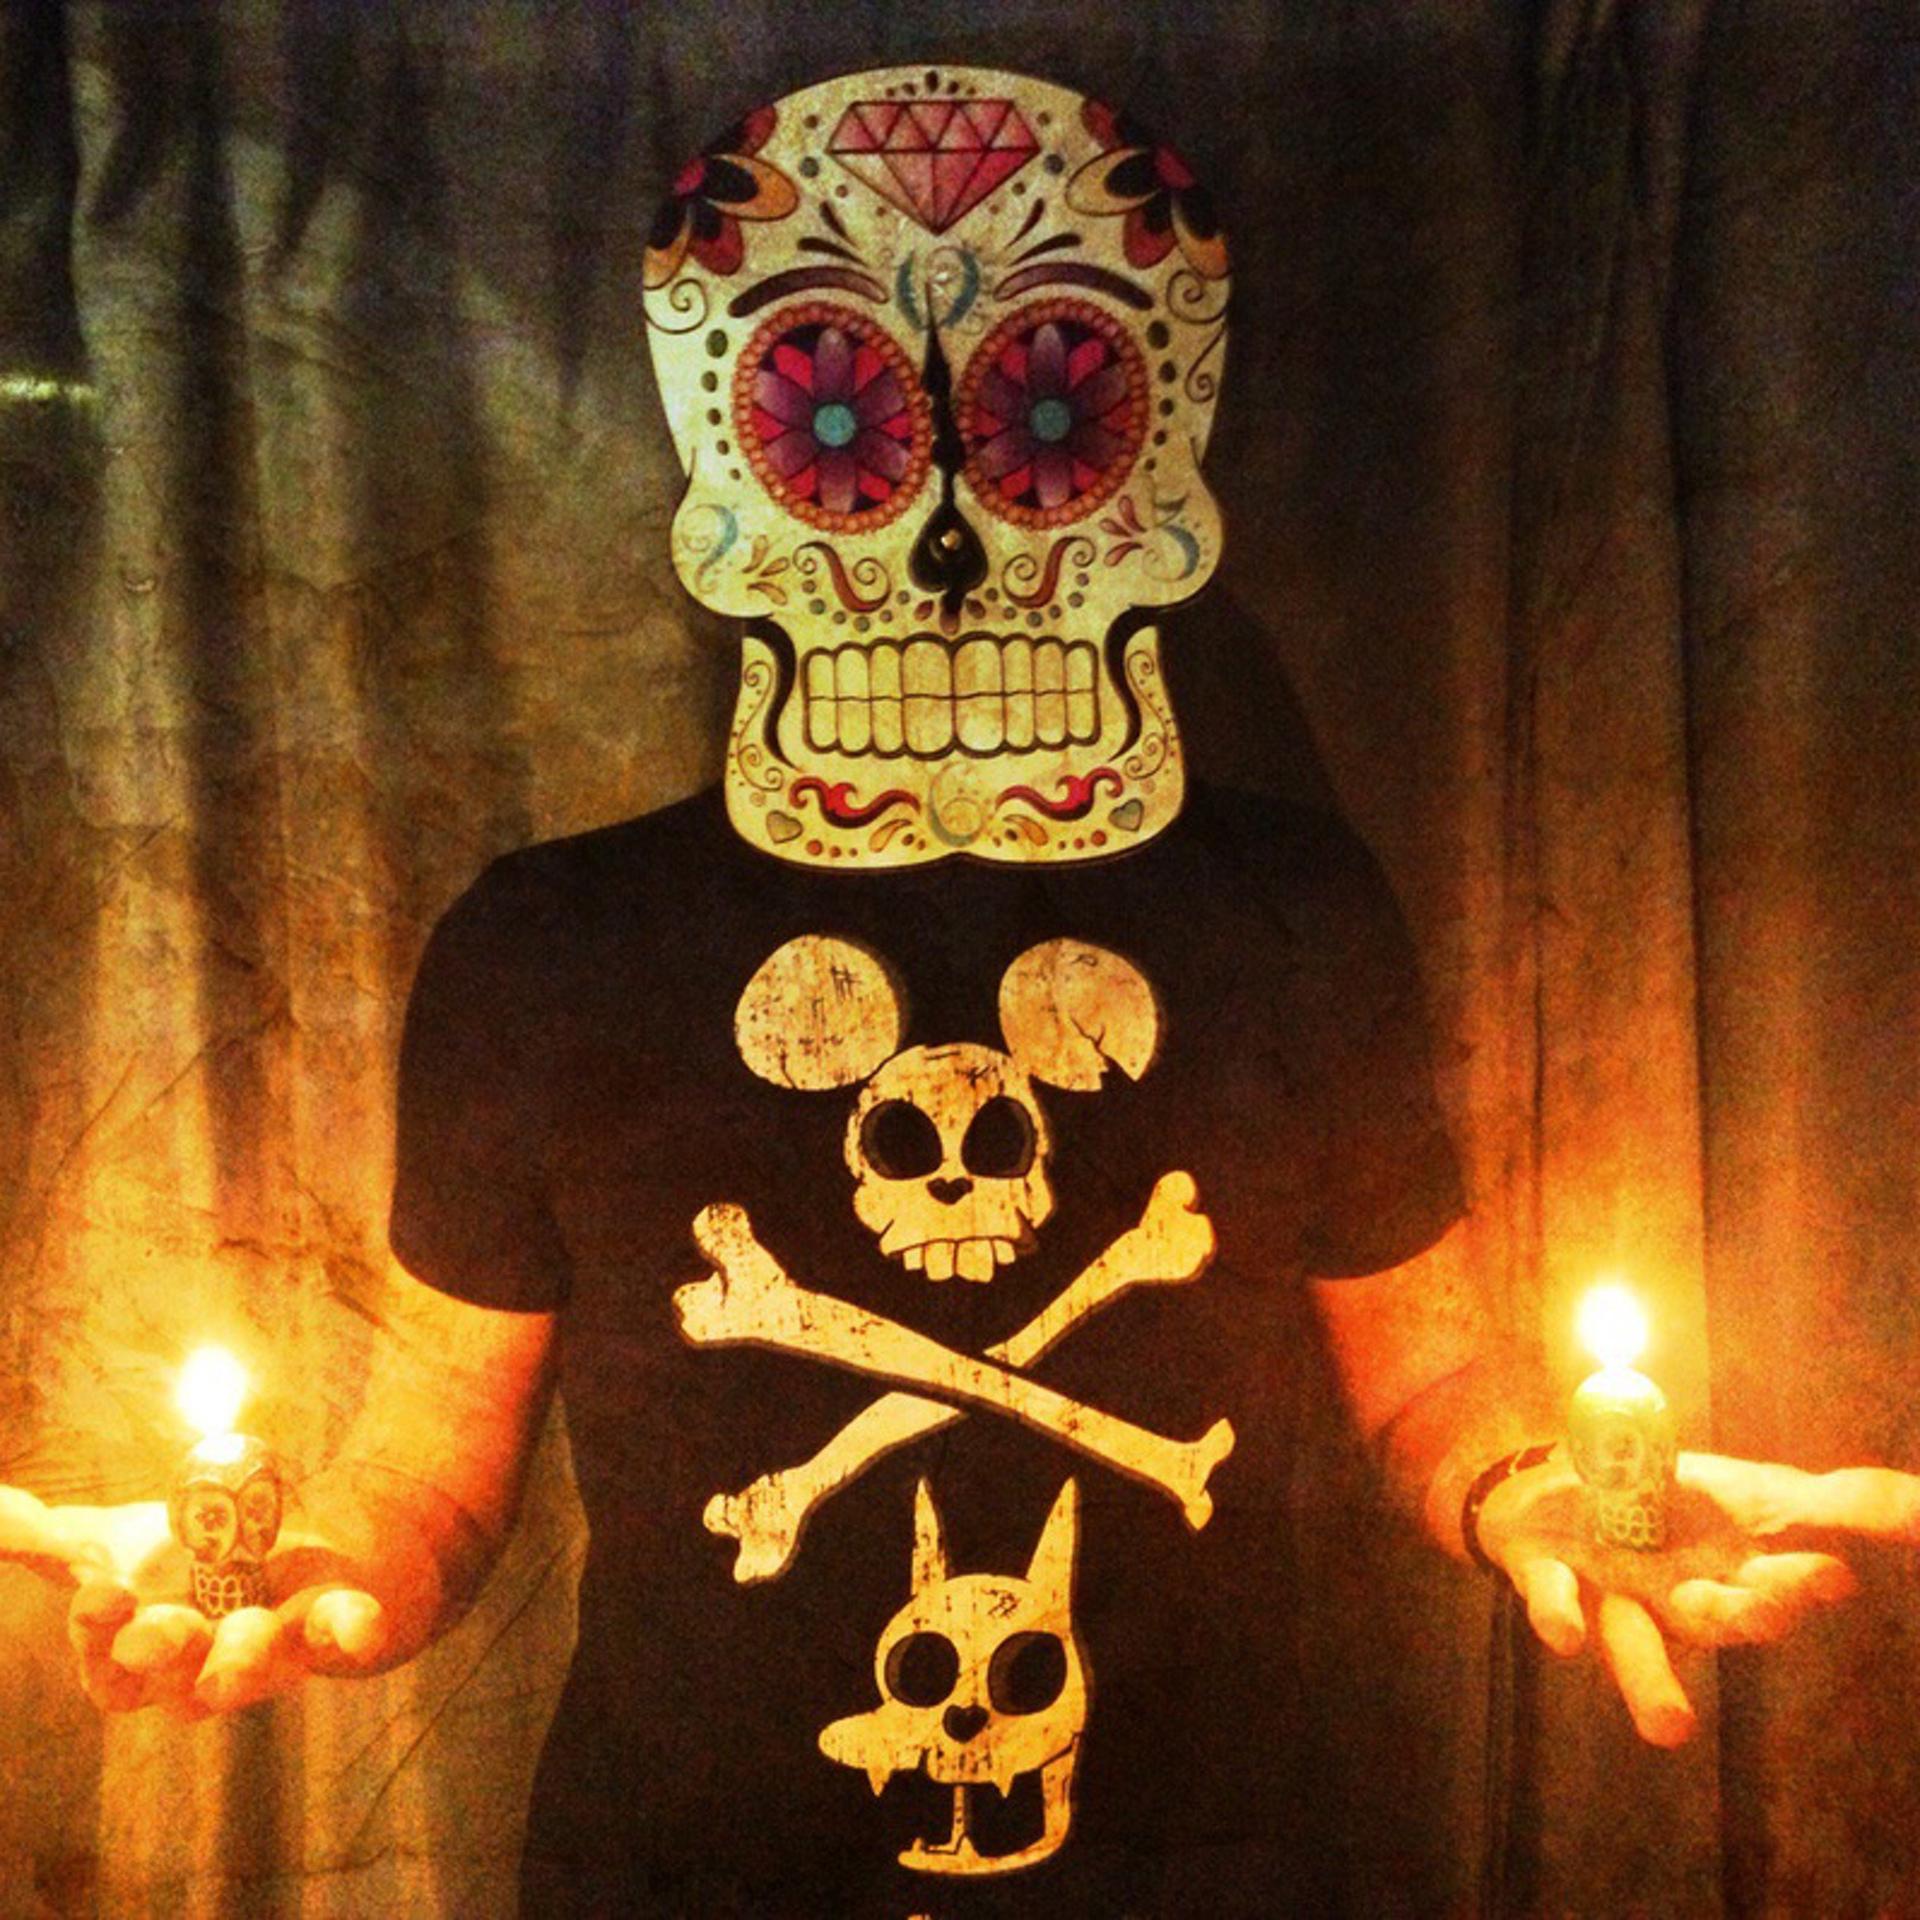 Halloween 2013 by Pako Campo